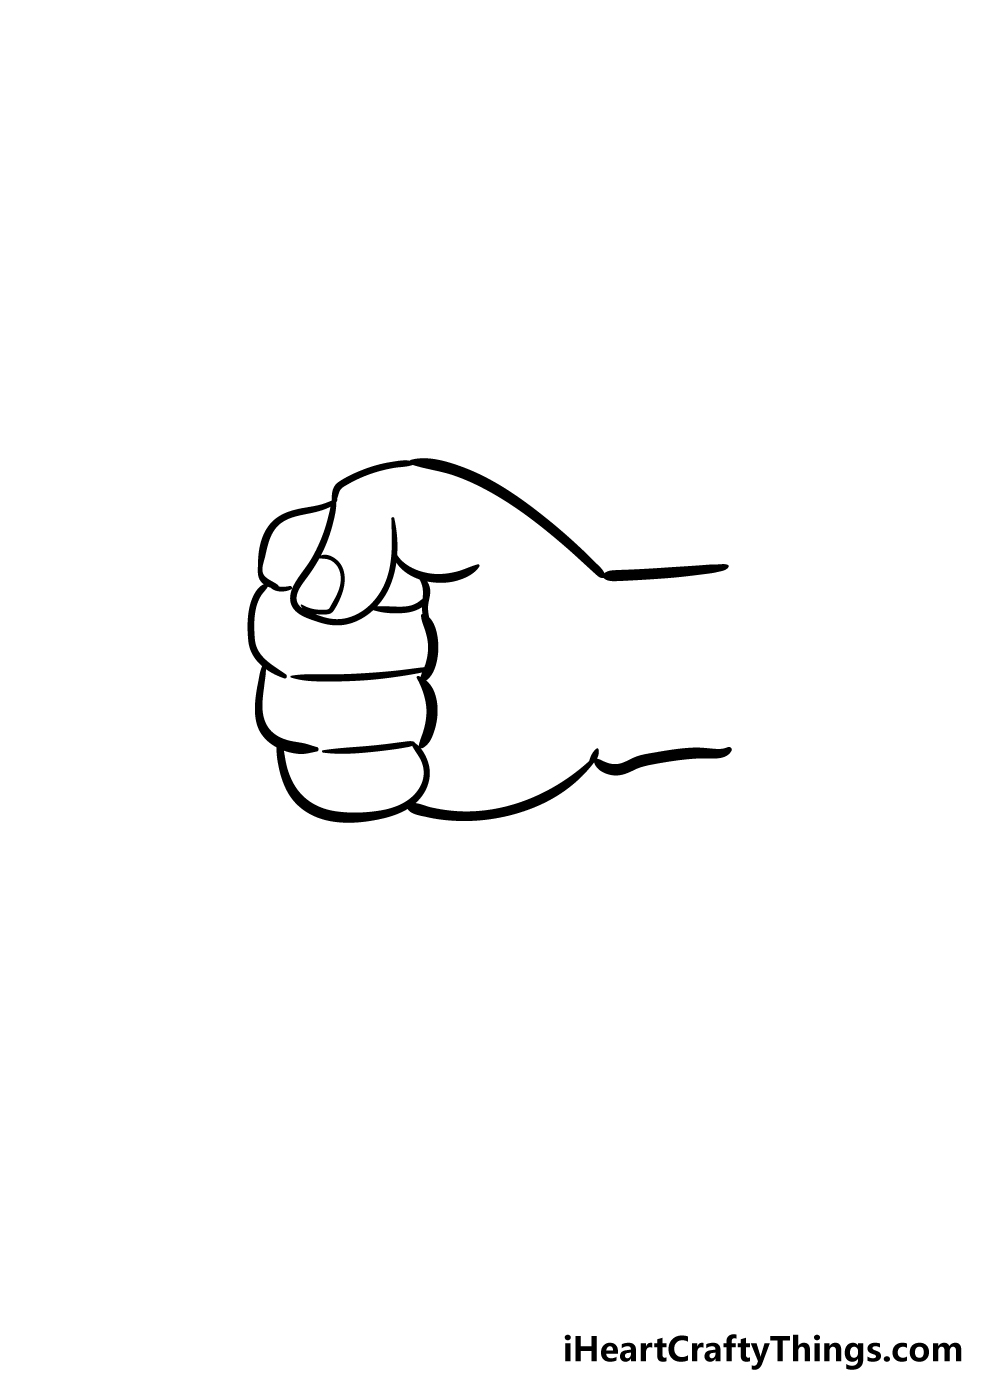 fist drawing step 4